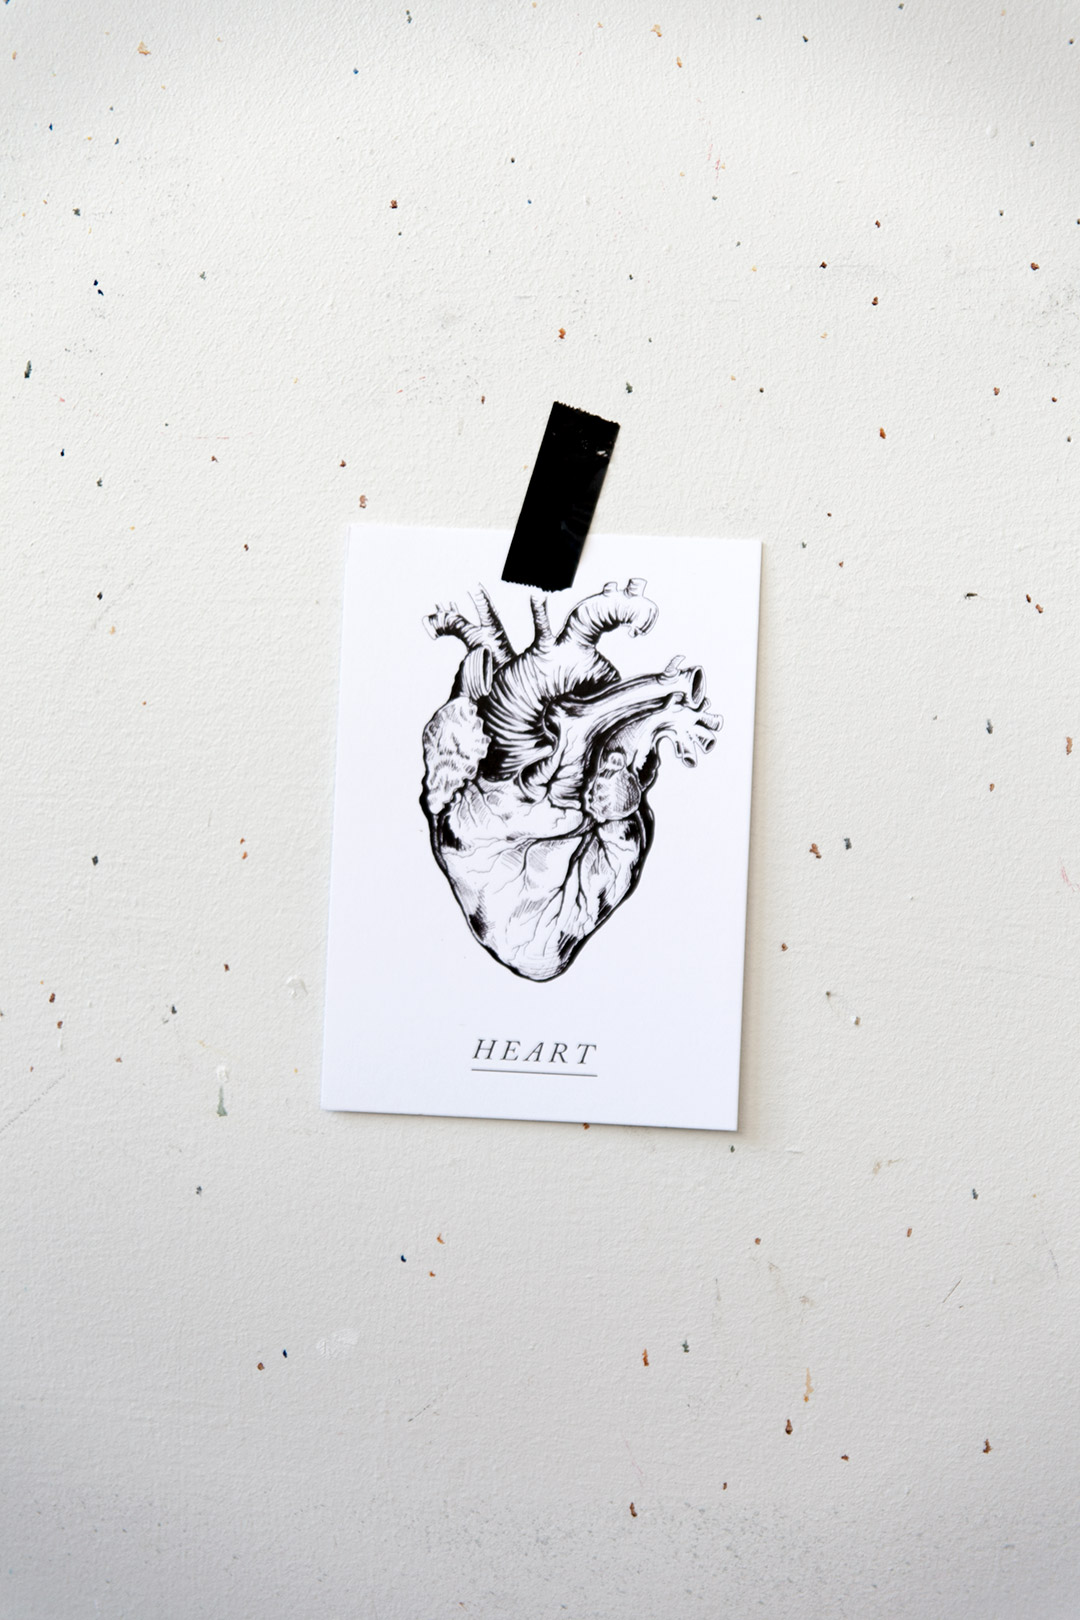 heart_inthewall